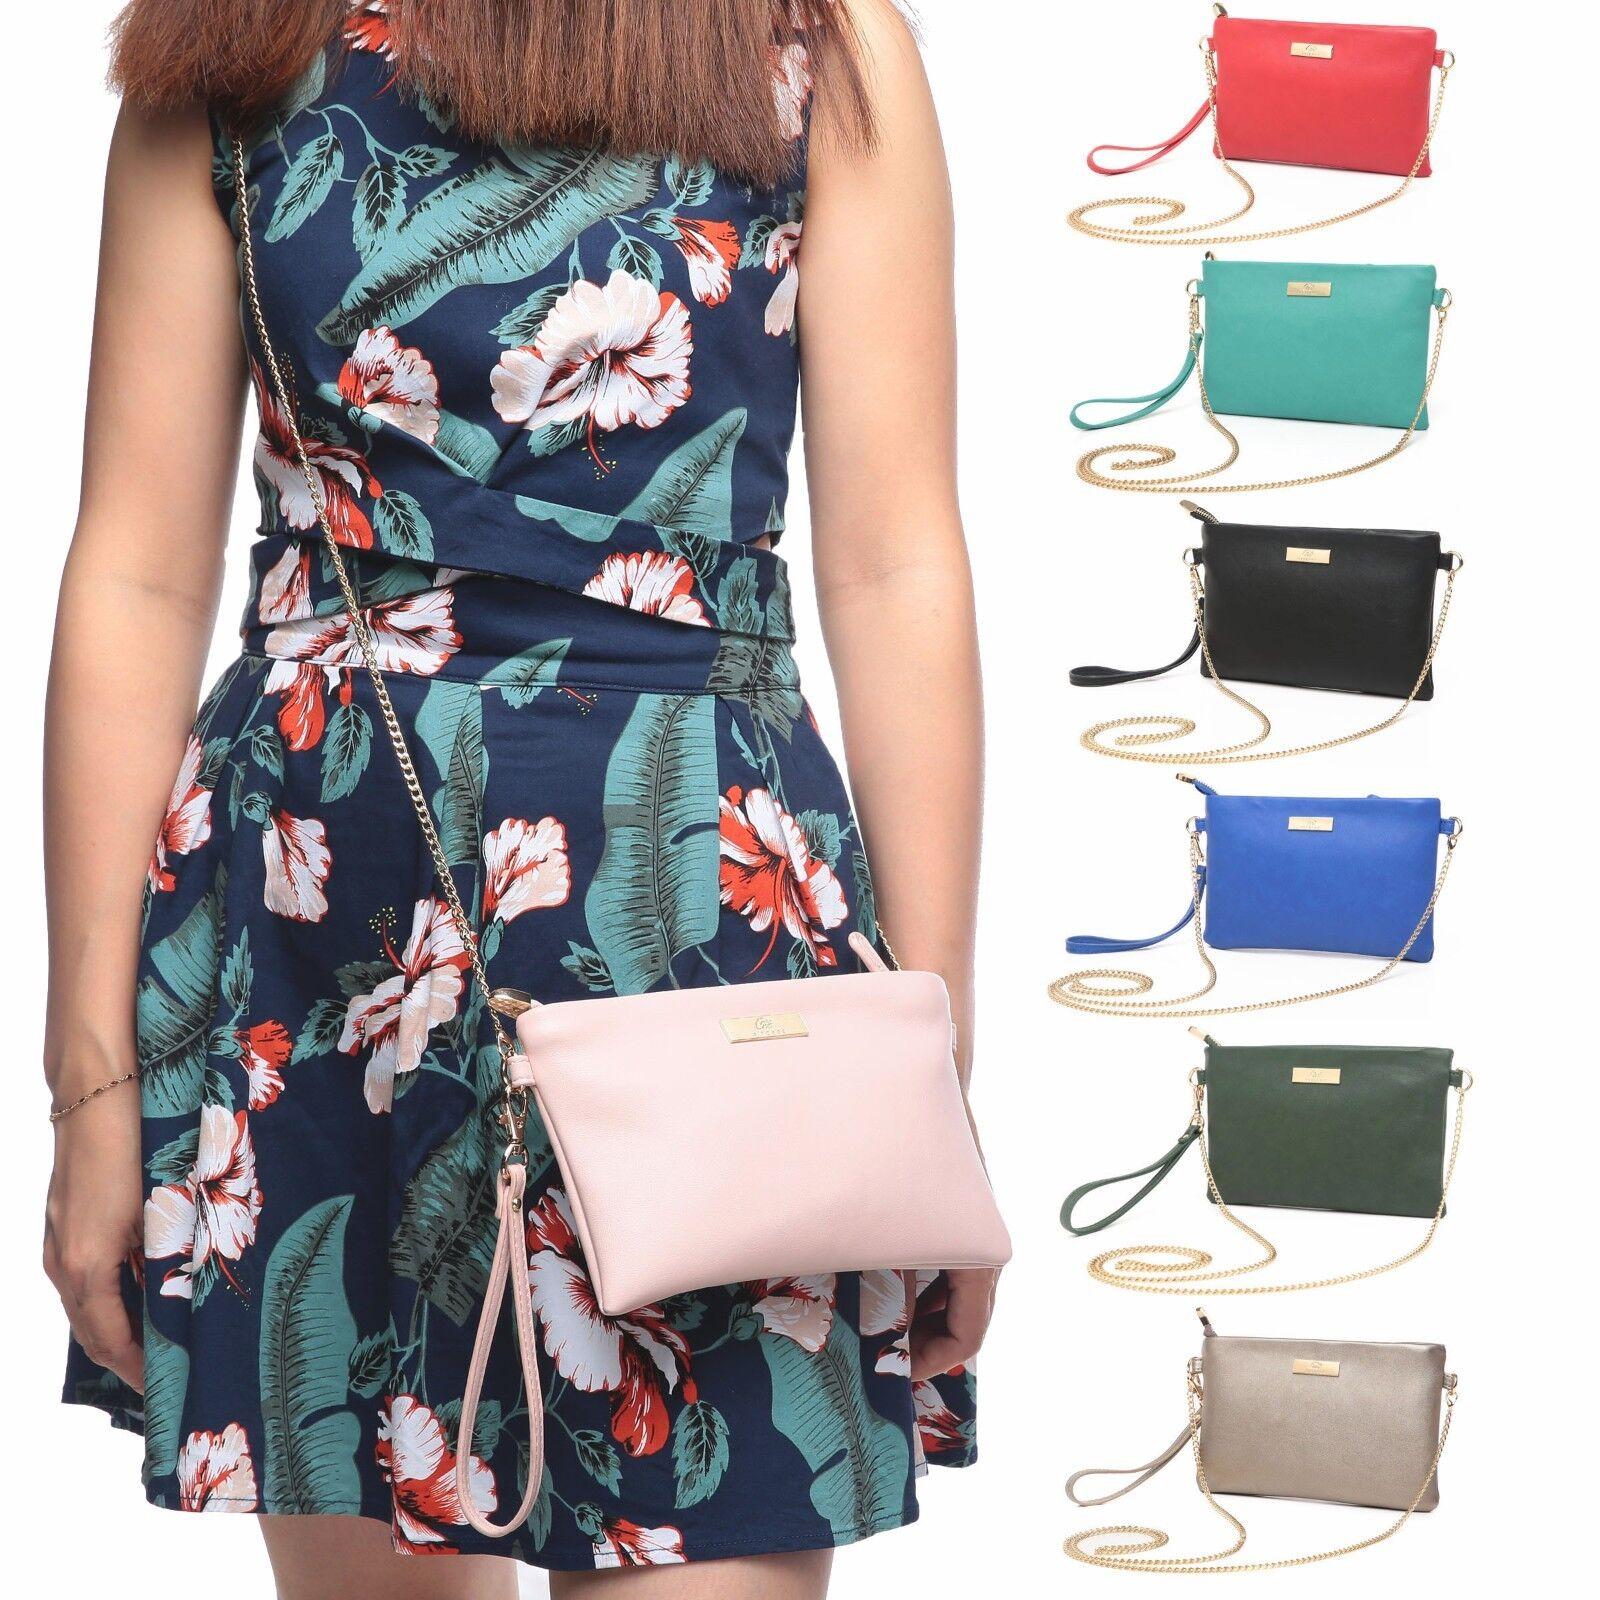 Aitbags Leather Zip Crossbody Bag Women Wallet Handbag Clutc